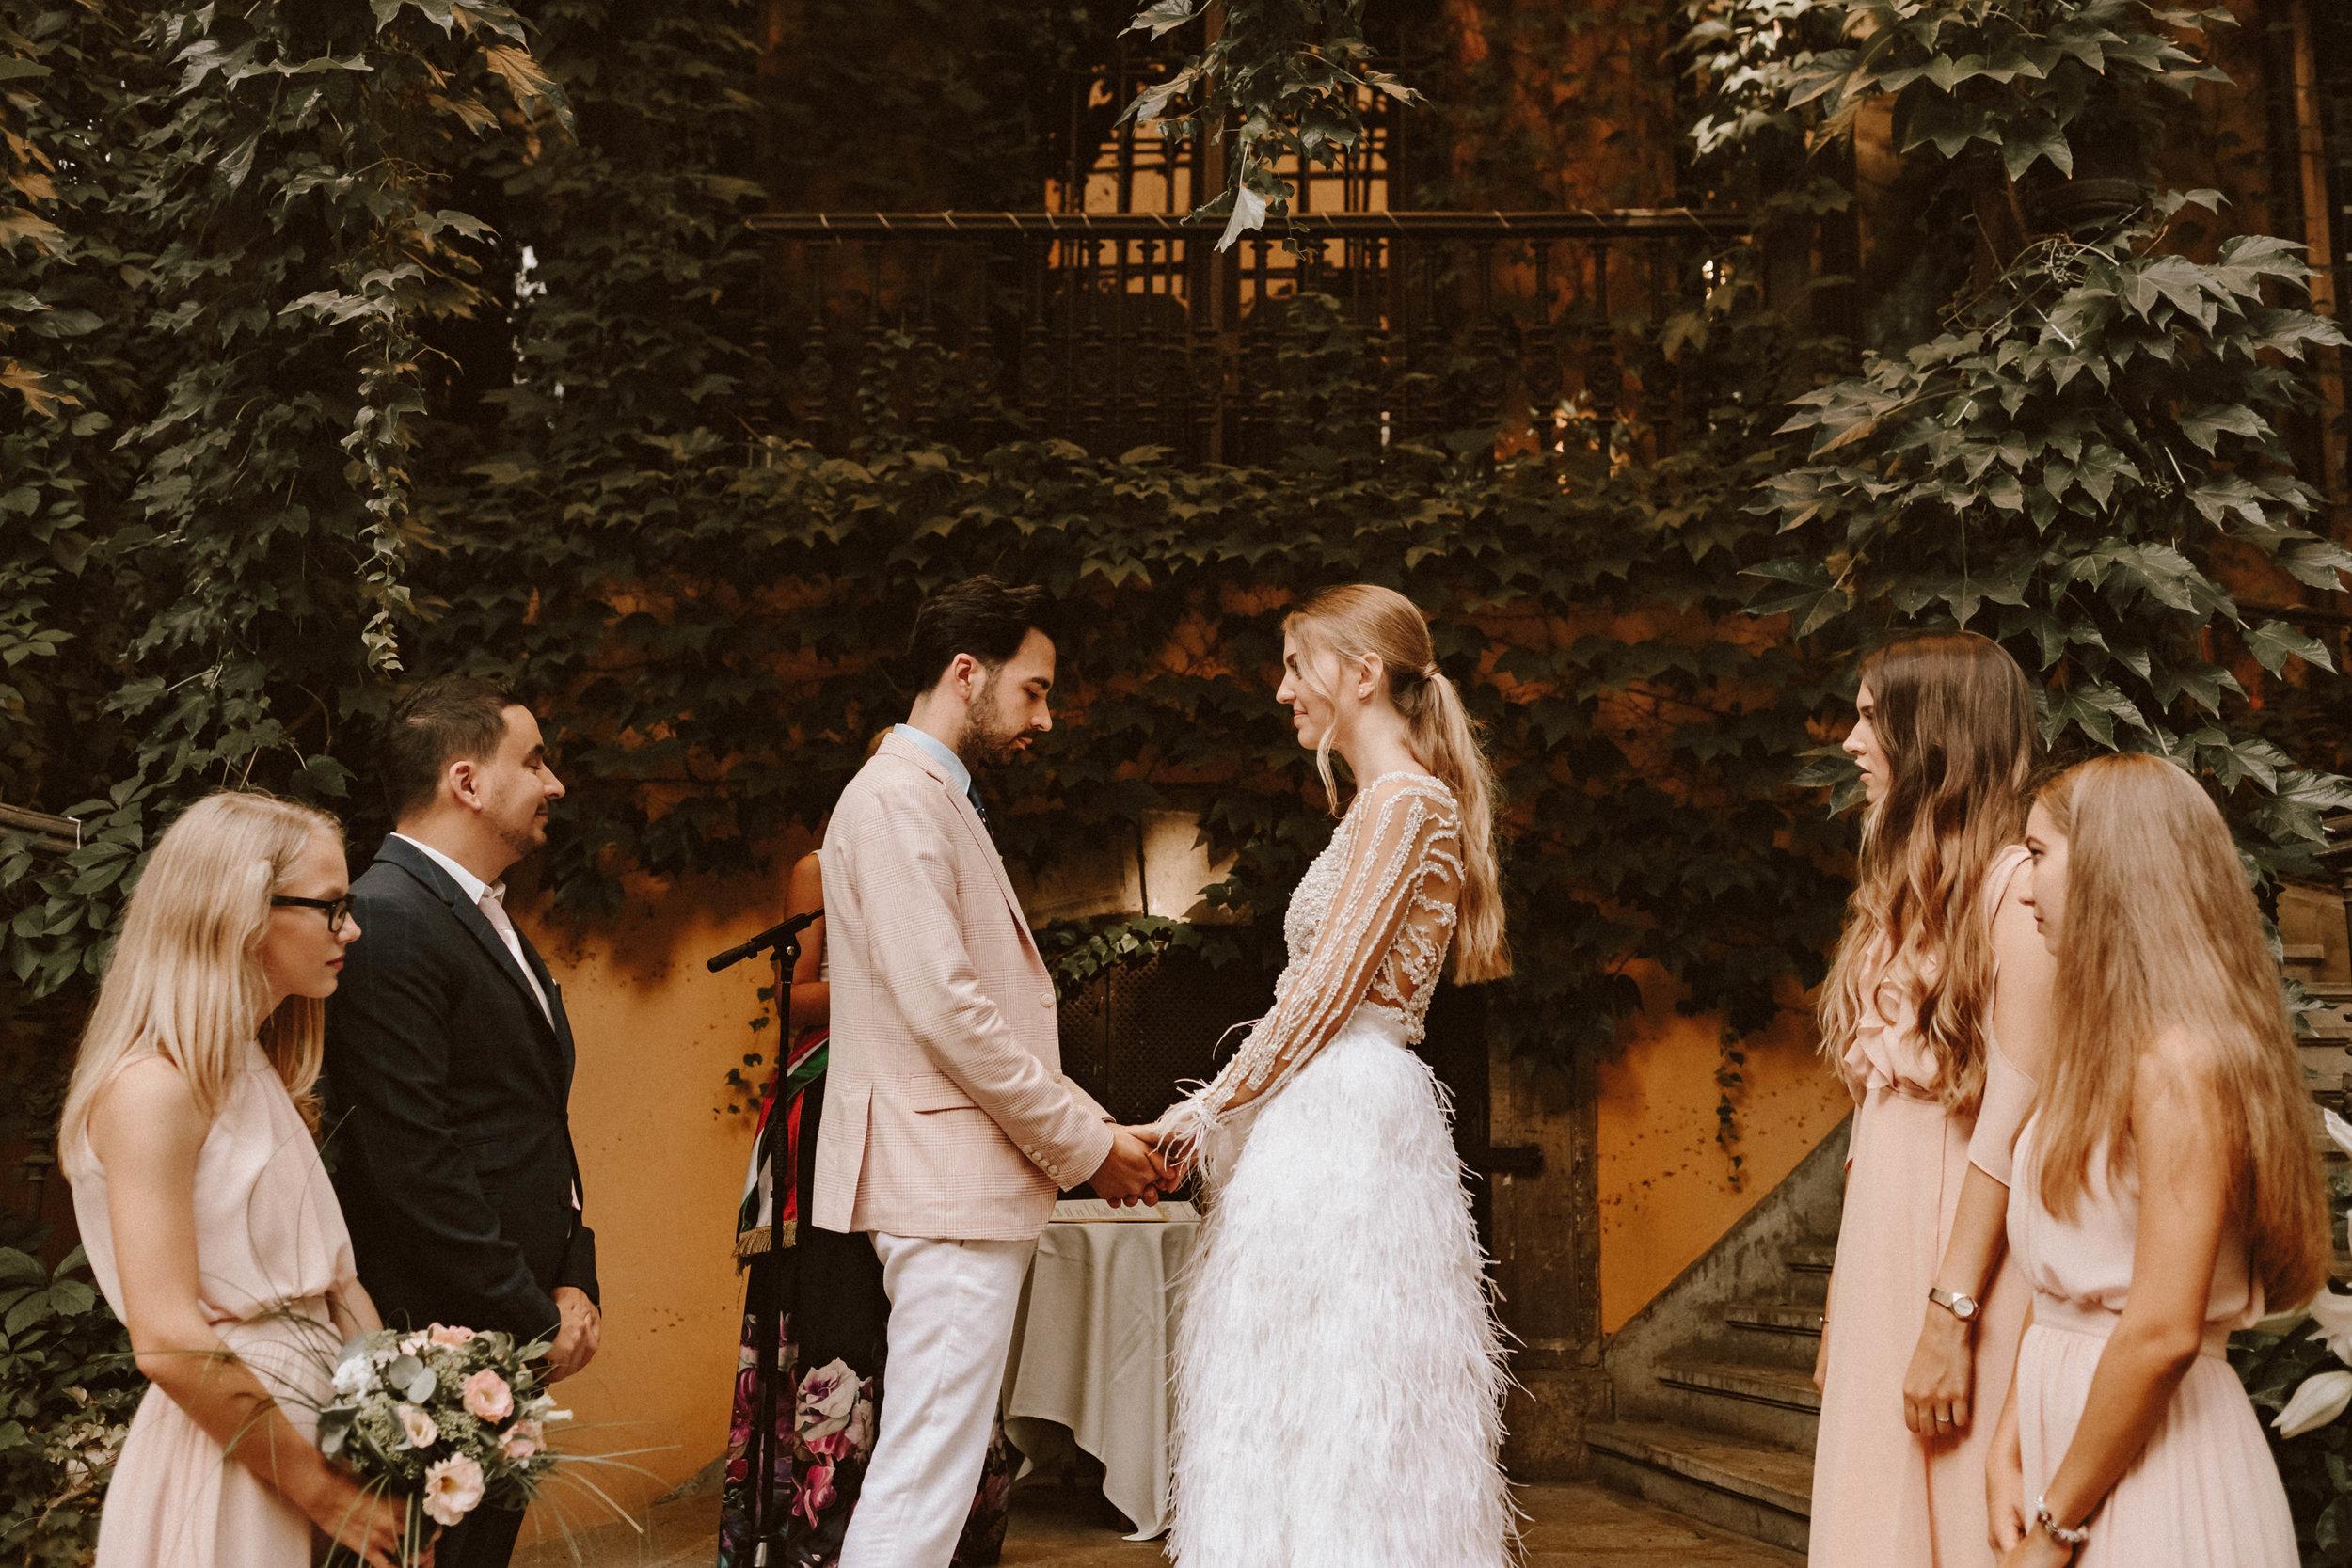 1819-Evelin+Peti-wedding-264-w.jpg